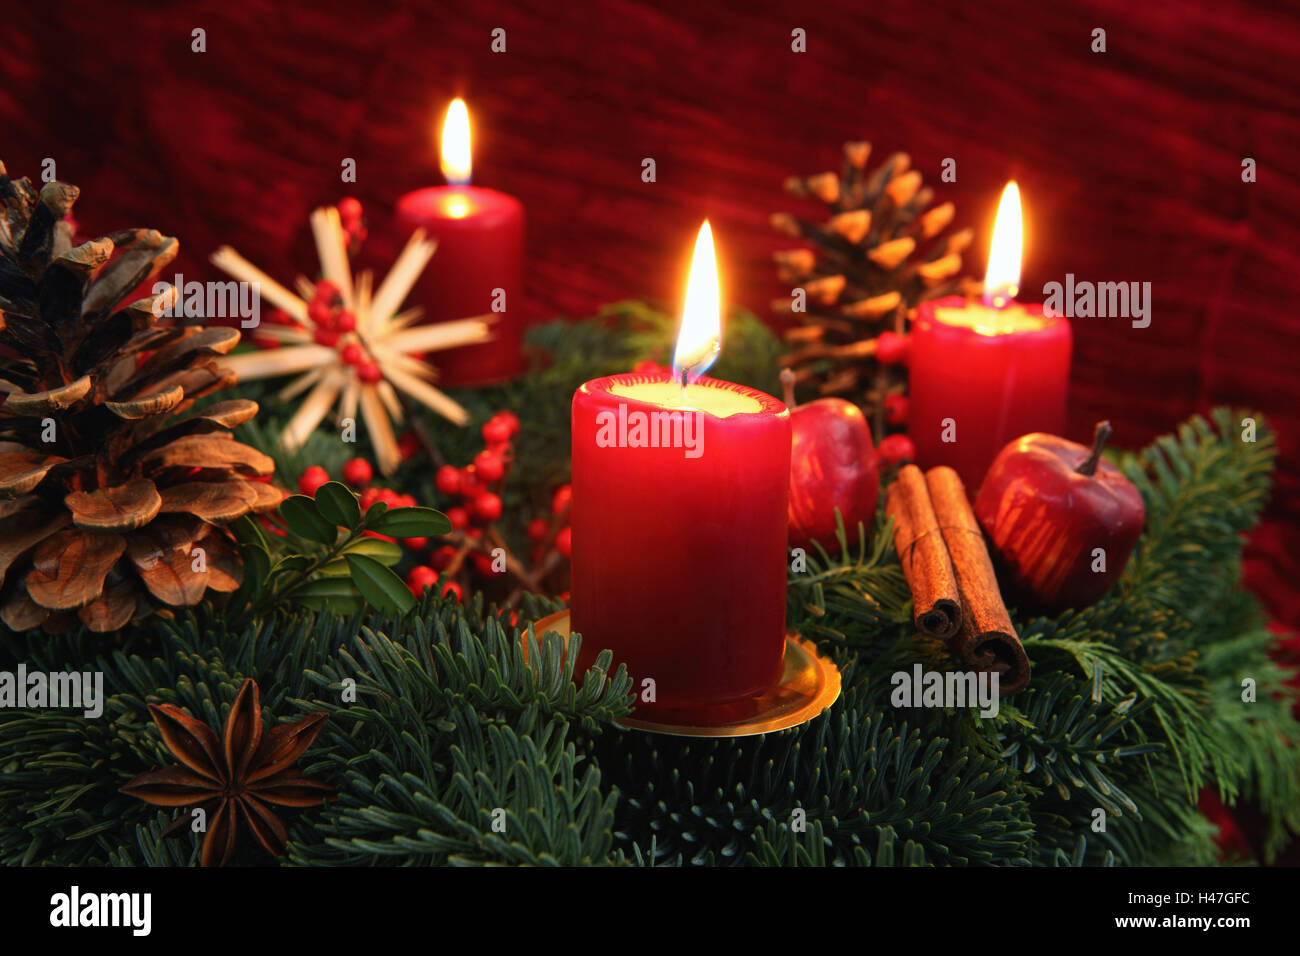 adventskranz drei brennende kerzen stockfoto bild. Black Bedroom Furniture Sets. Home Design Ideas